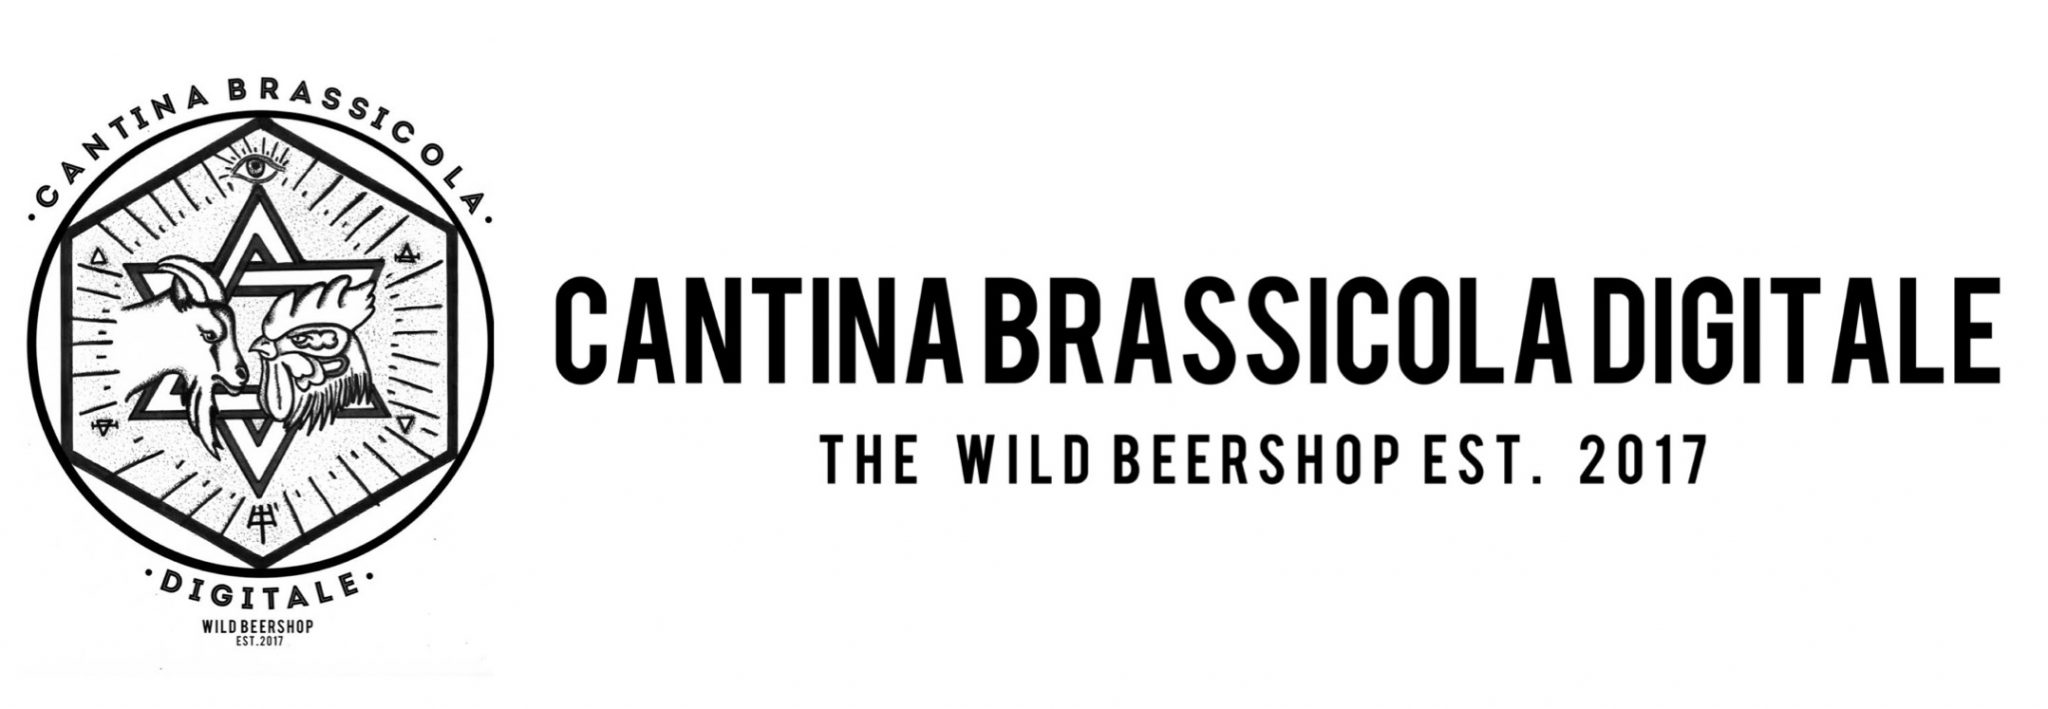 Cantina Brassicola Digitale